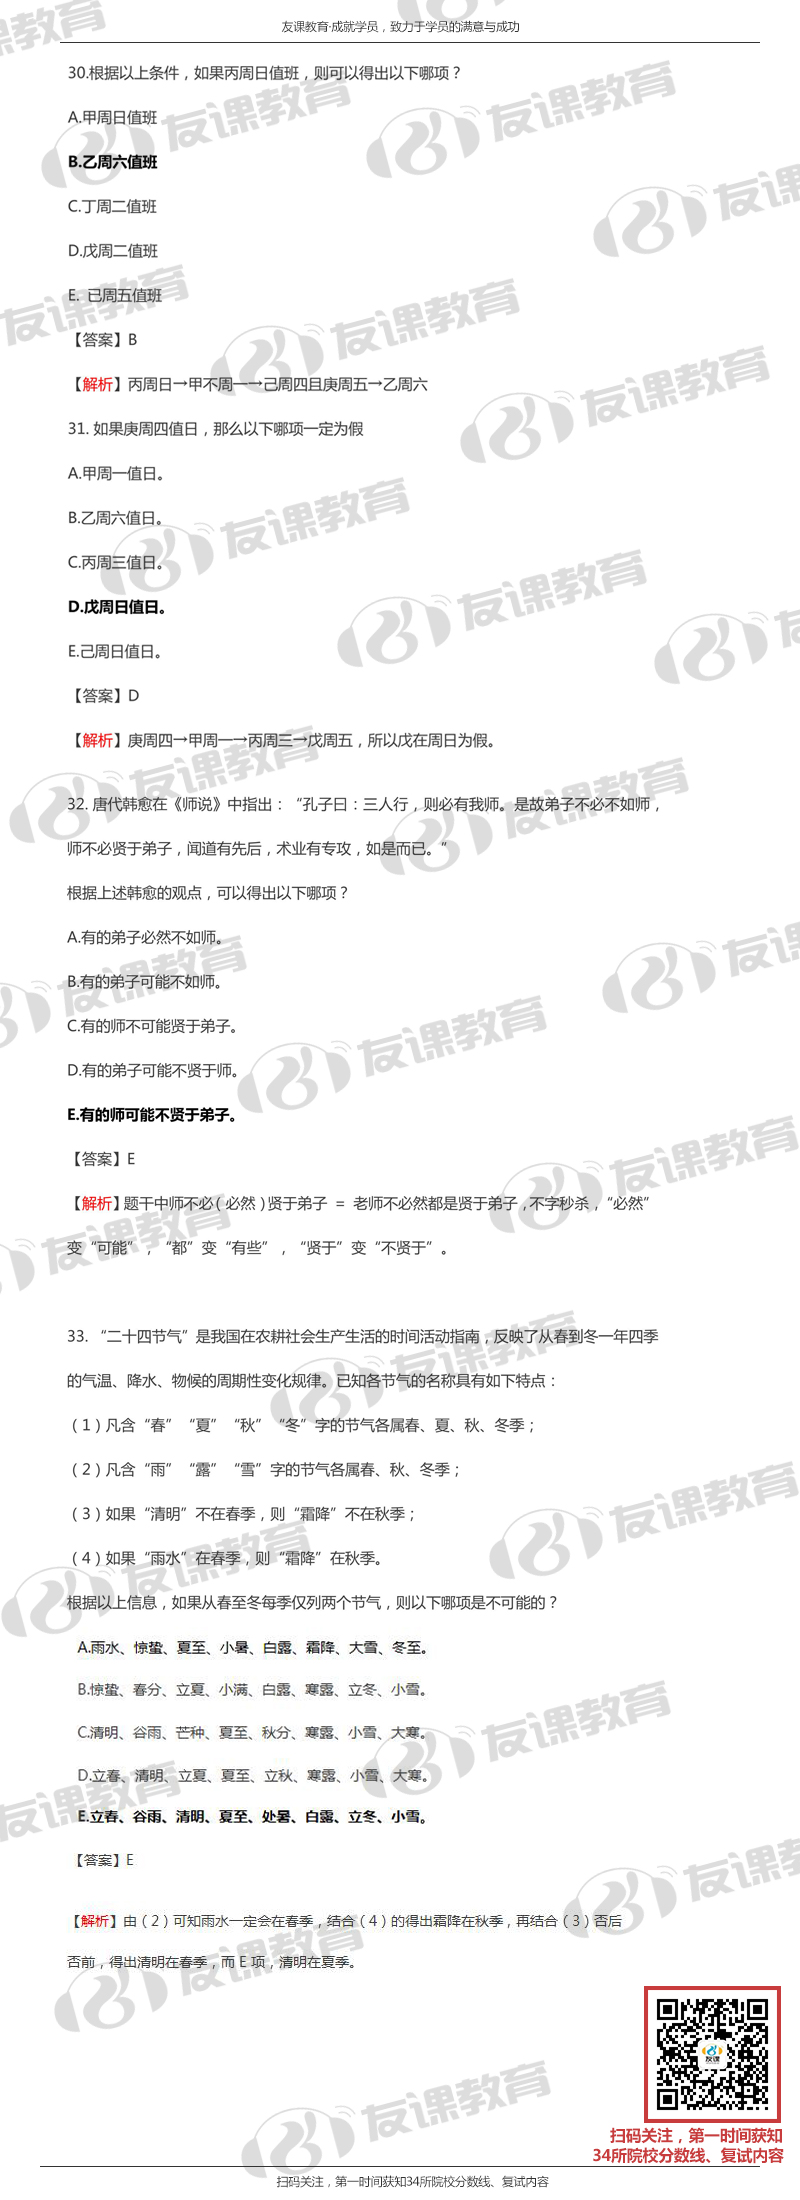 2018MBA聯考邏輯真題及解析3(友課教育版).jpg